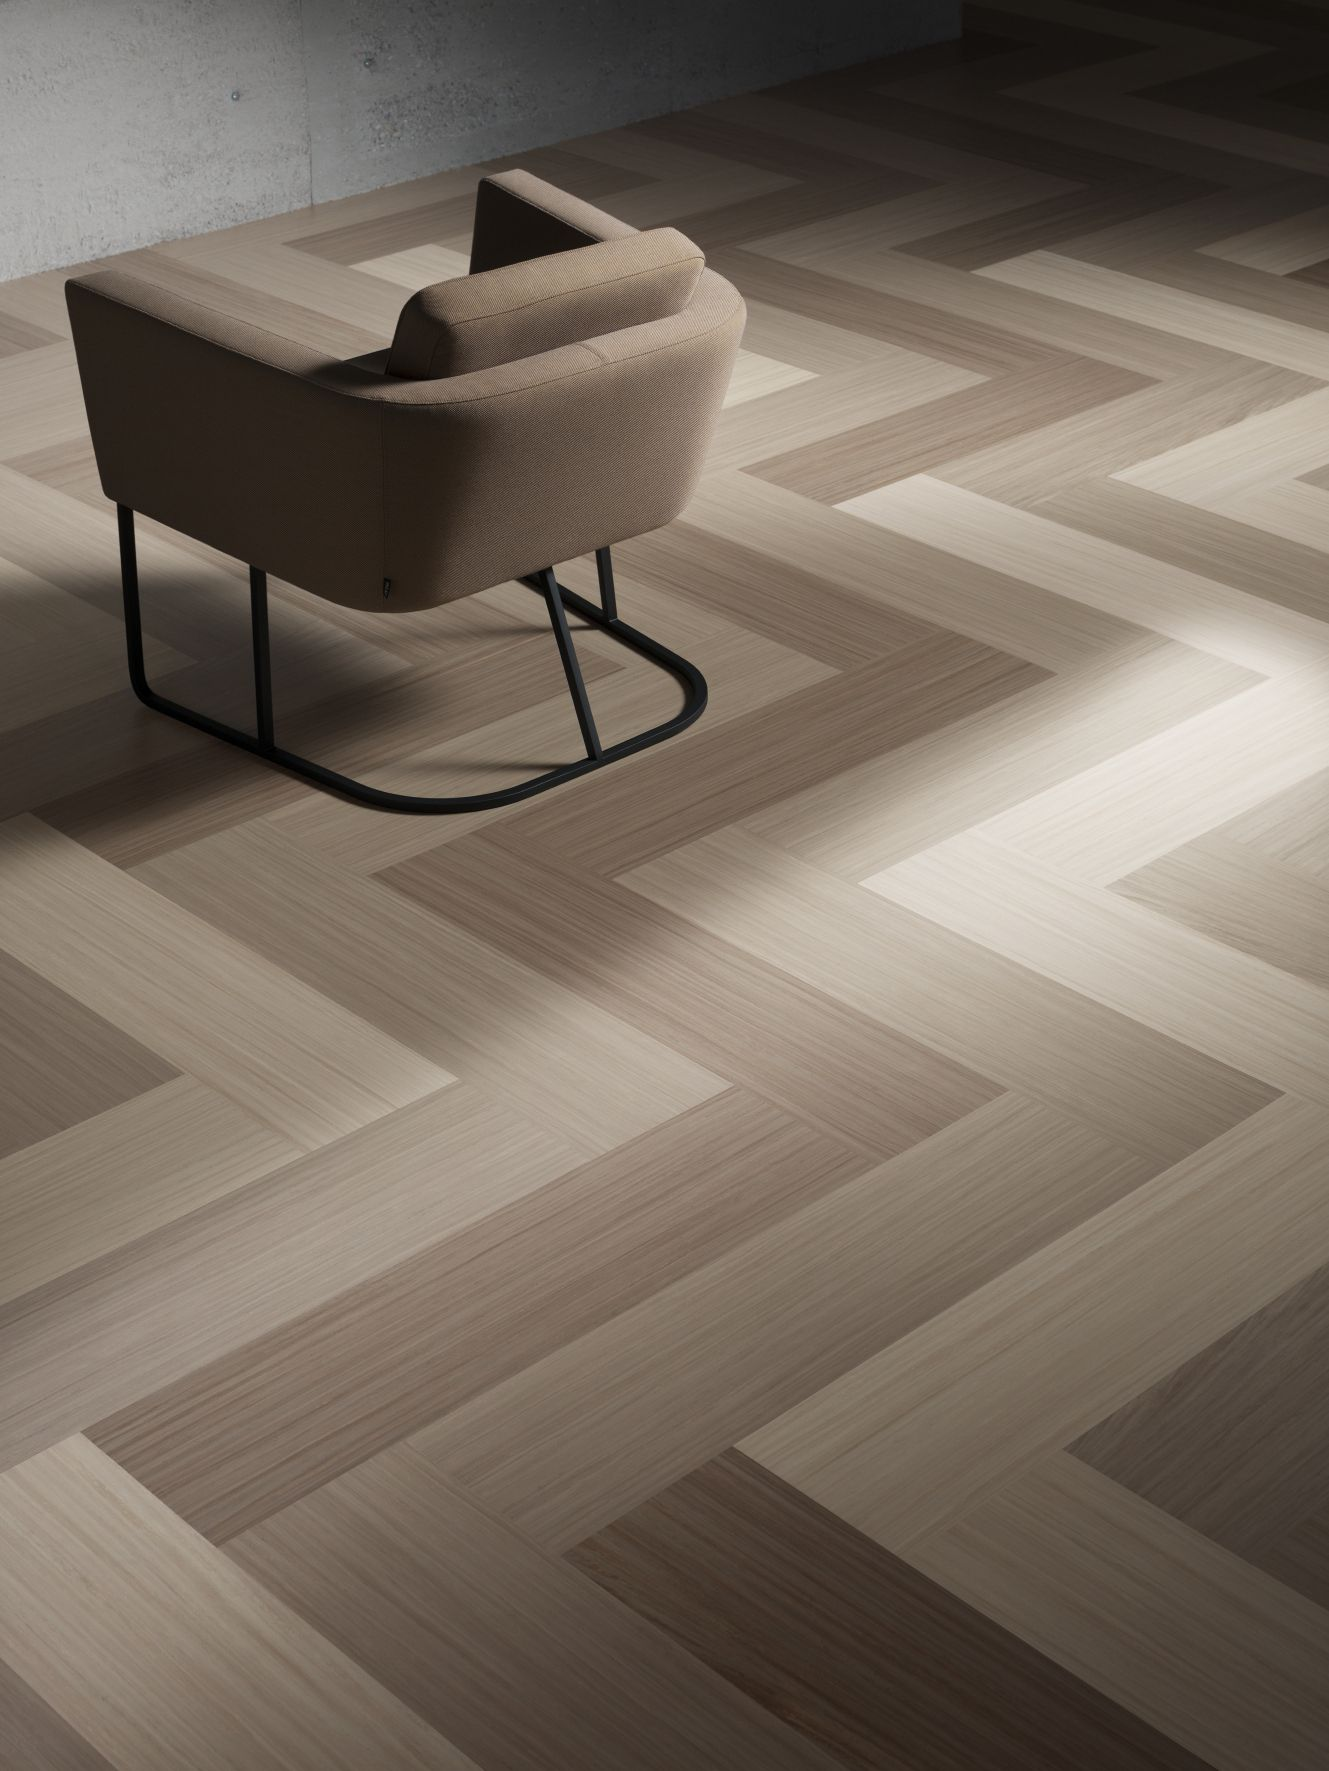 Forbo Modular Tile In Striato 5230 5235 5217 100 X 25 Planks Forbo Modular Winner Of Adex Platinum Award 2 Marmoleum Marmoleum Floors Floor Tile Design